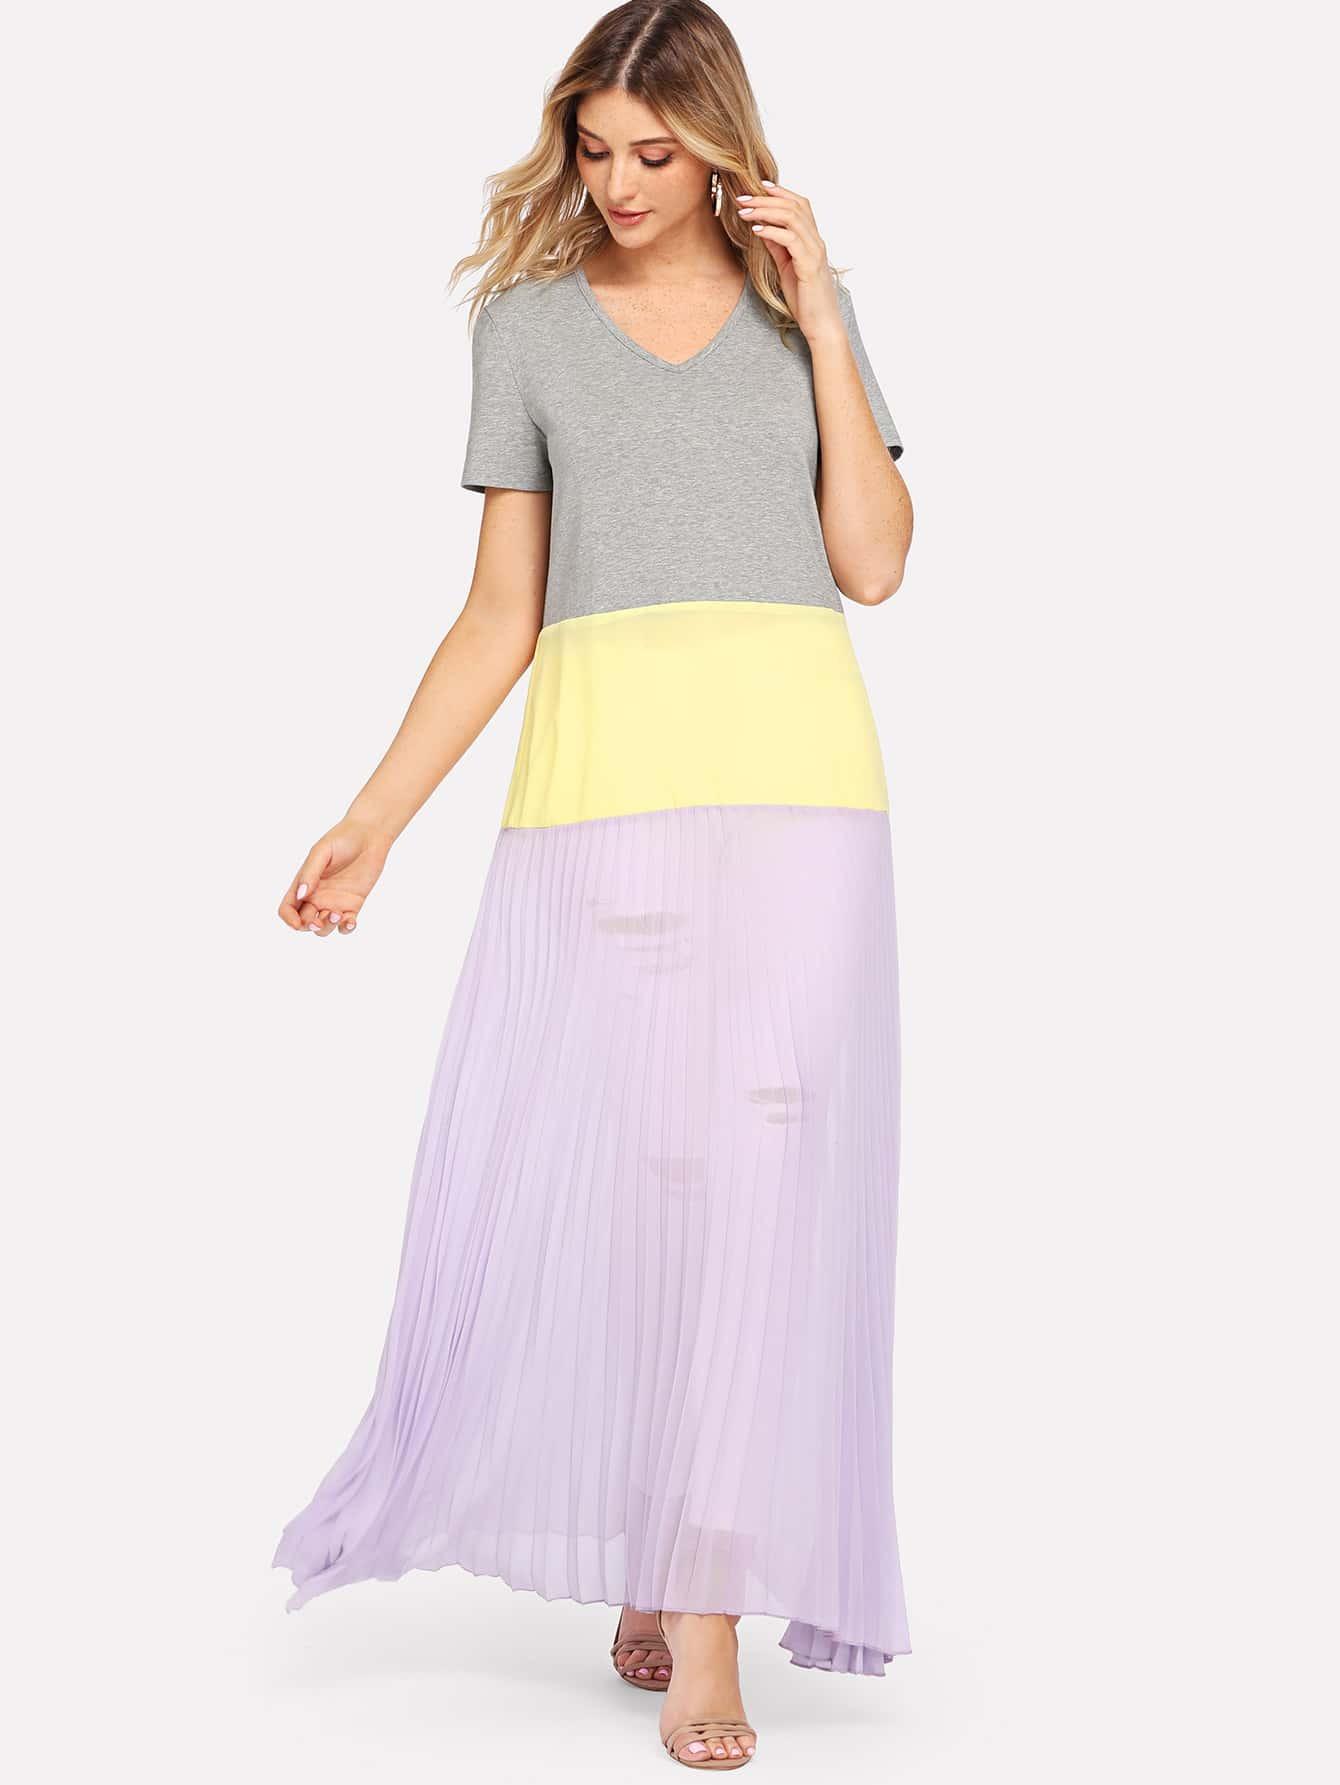 Cut And Sew Mixed Media Dress surplice neck mixed media dress